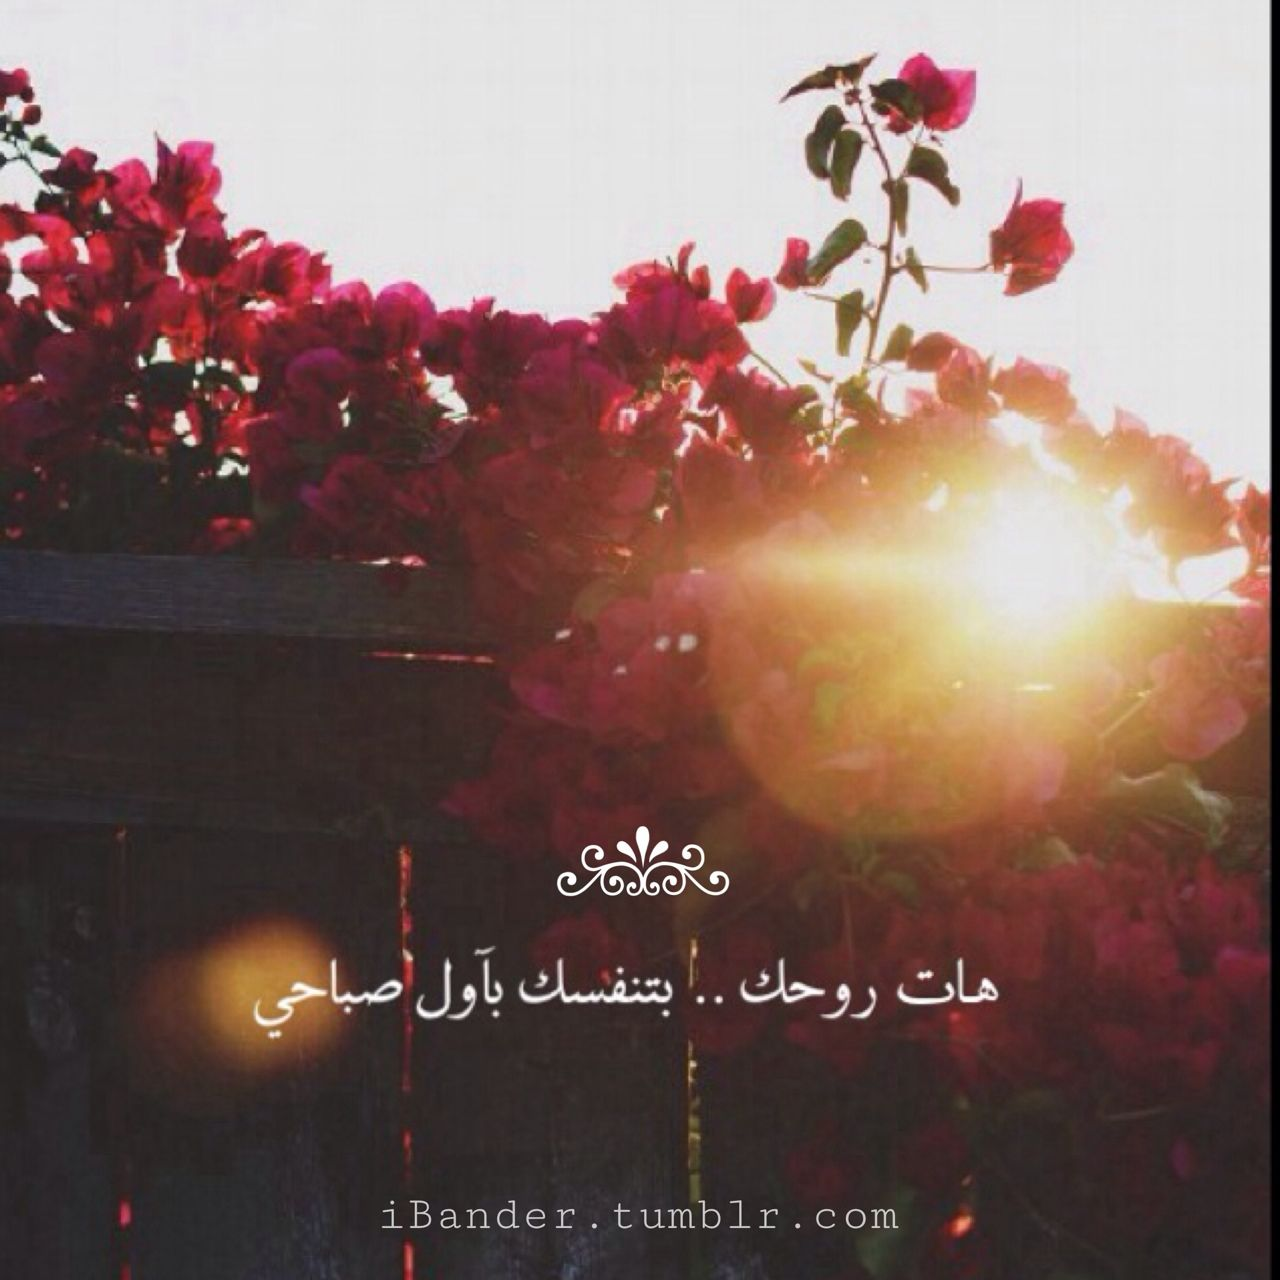 Bander هات روحك بتنفسك Beautiful Morning Messages Morning Love Quotes Romantic Words